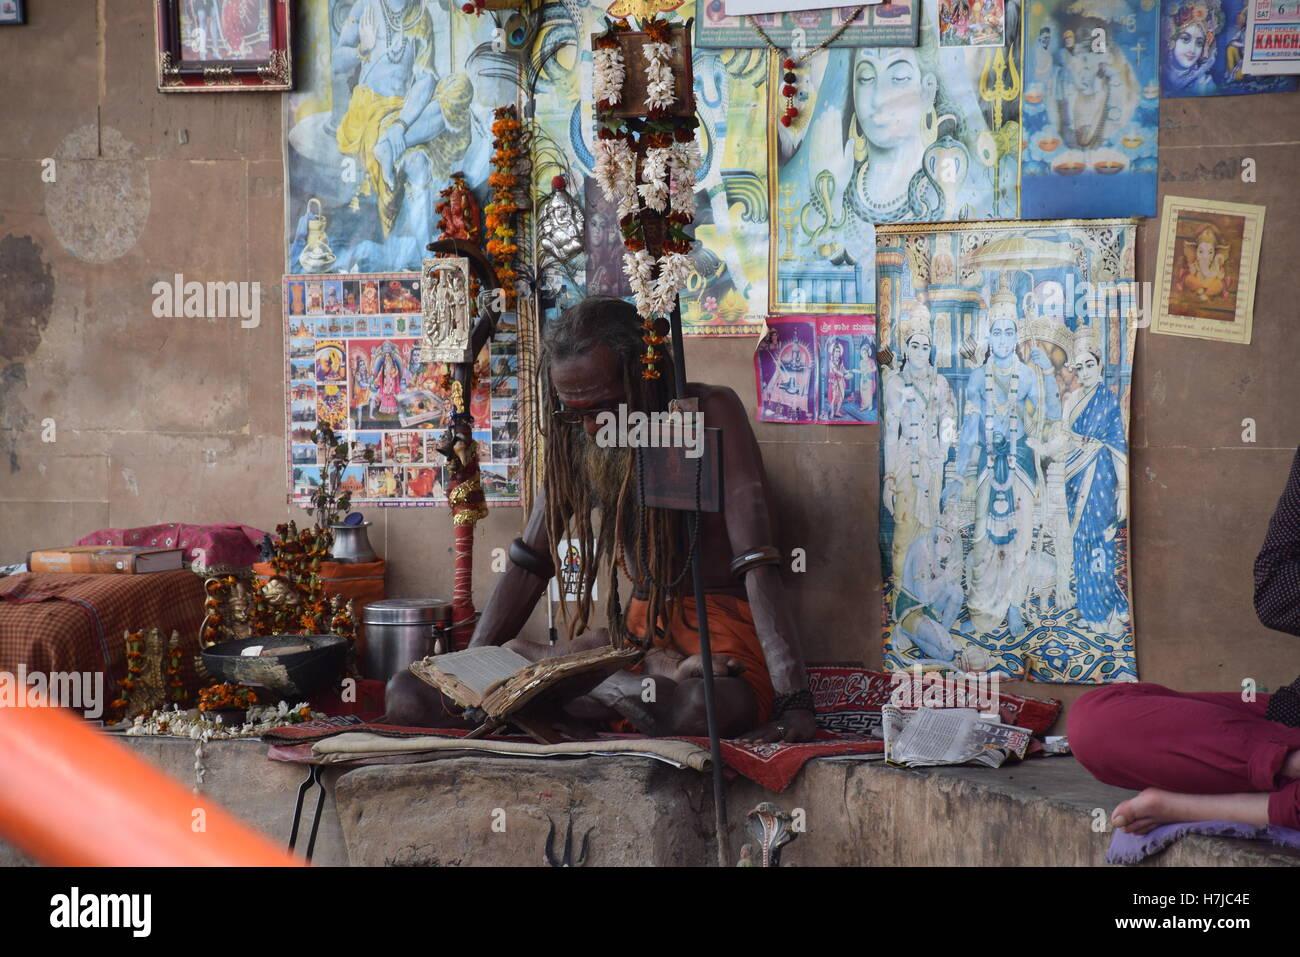 Indian sadhu sitting and reading with images of indian gods in Varanasi, Uttar Pradesh, India - Stock Image